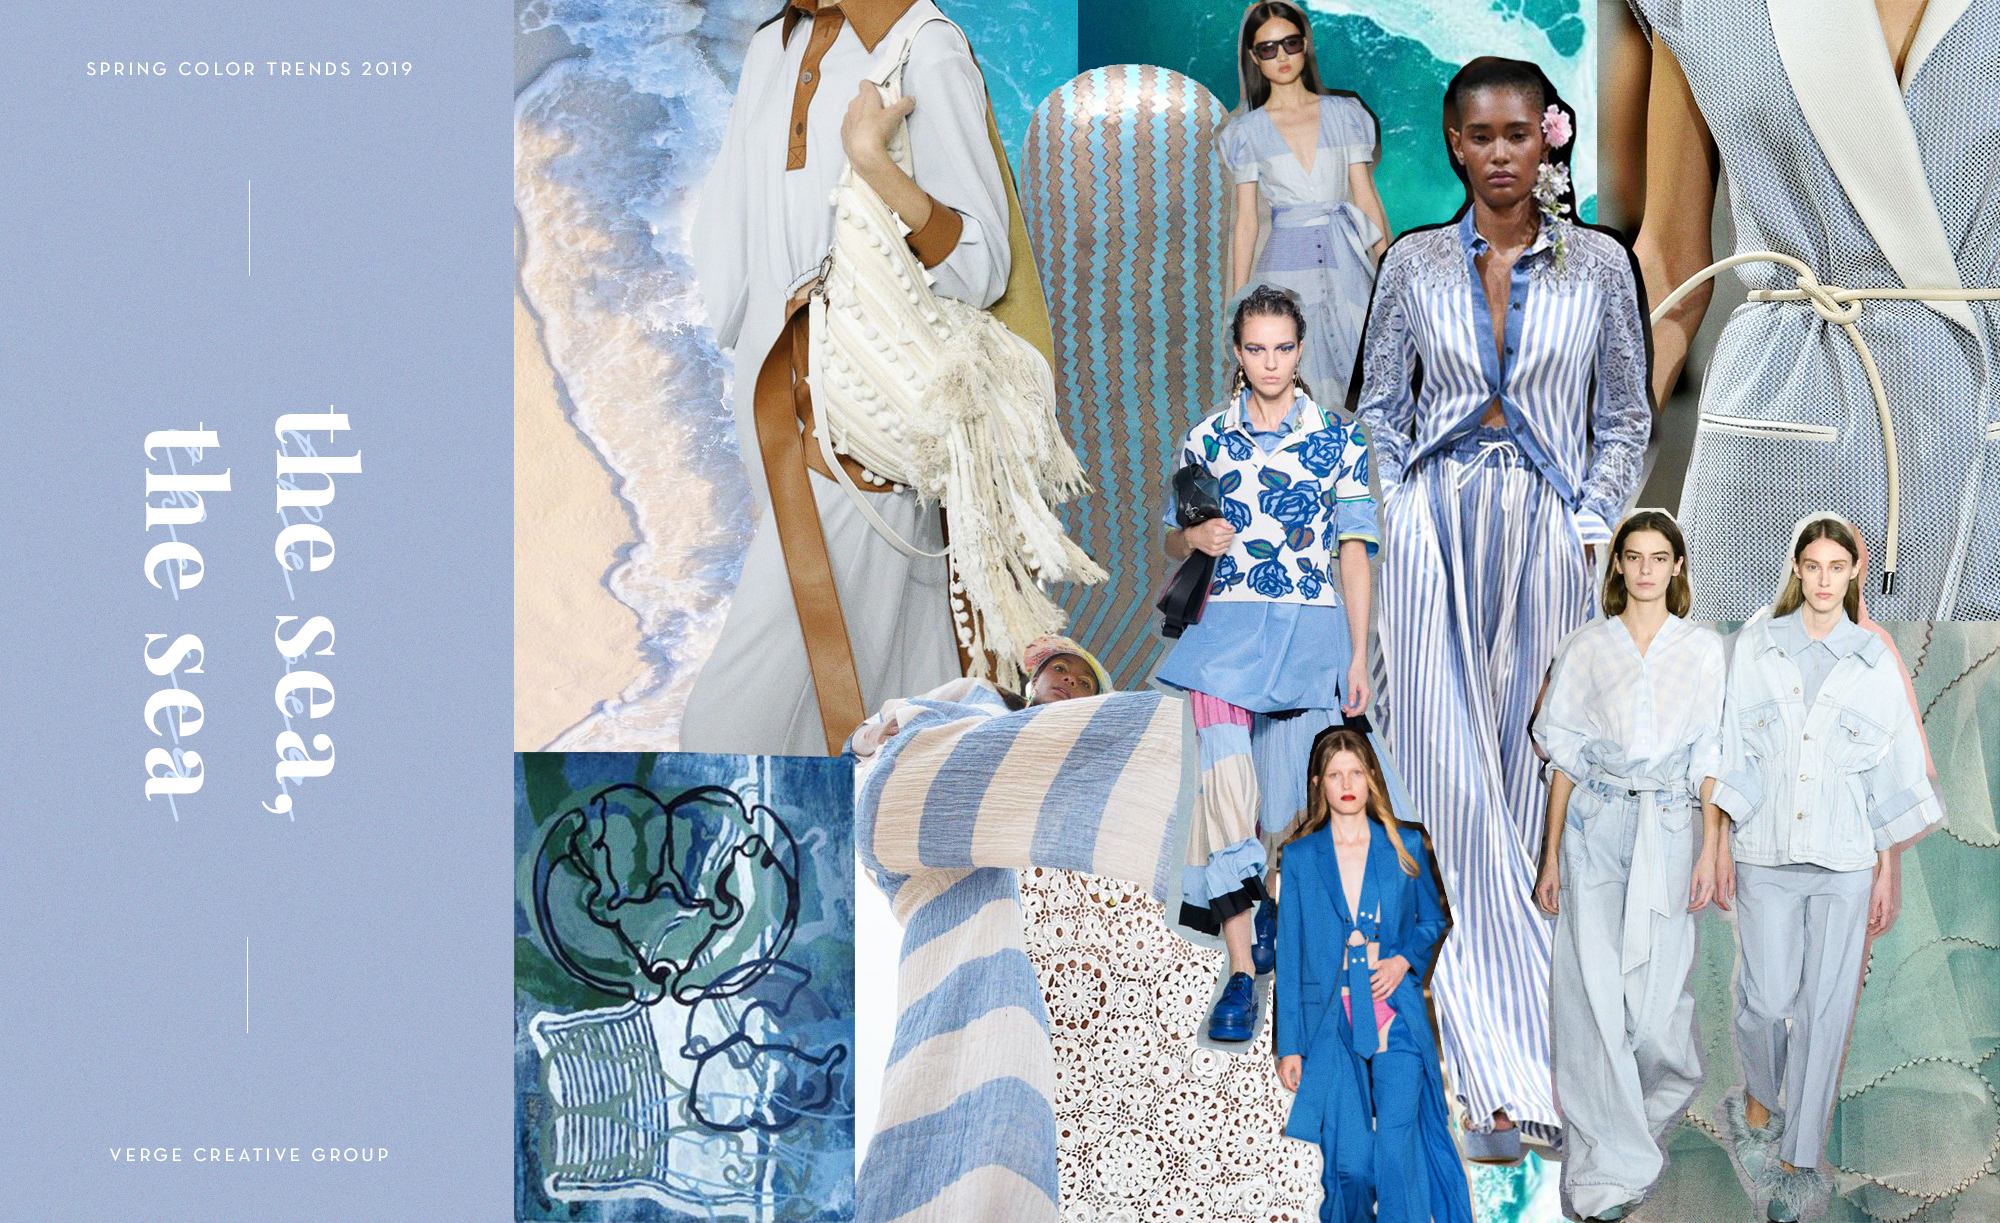 verge-creative-group-spring-color-trends-sea.jpg